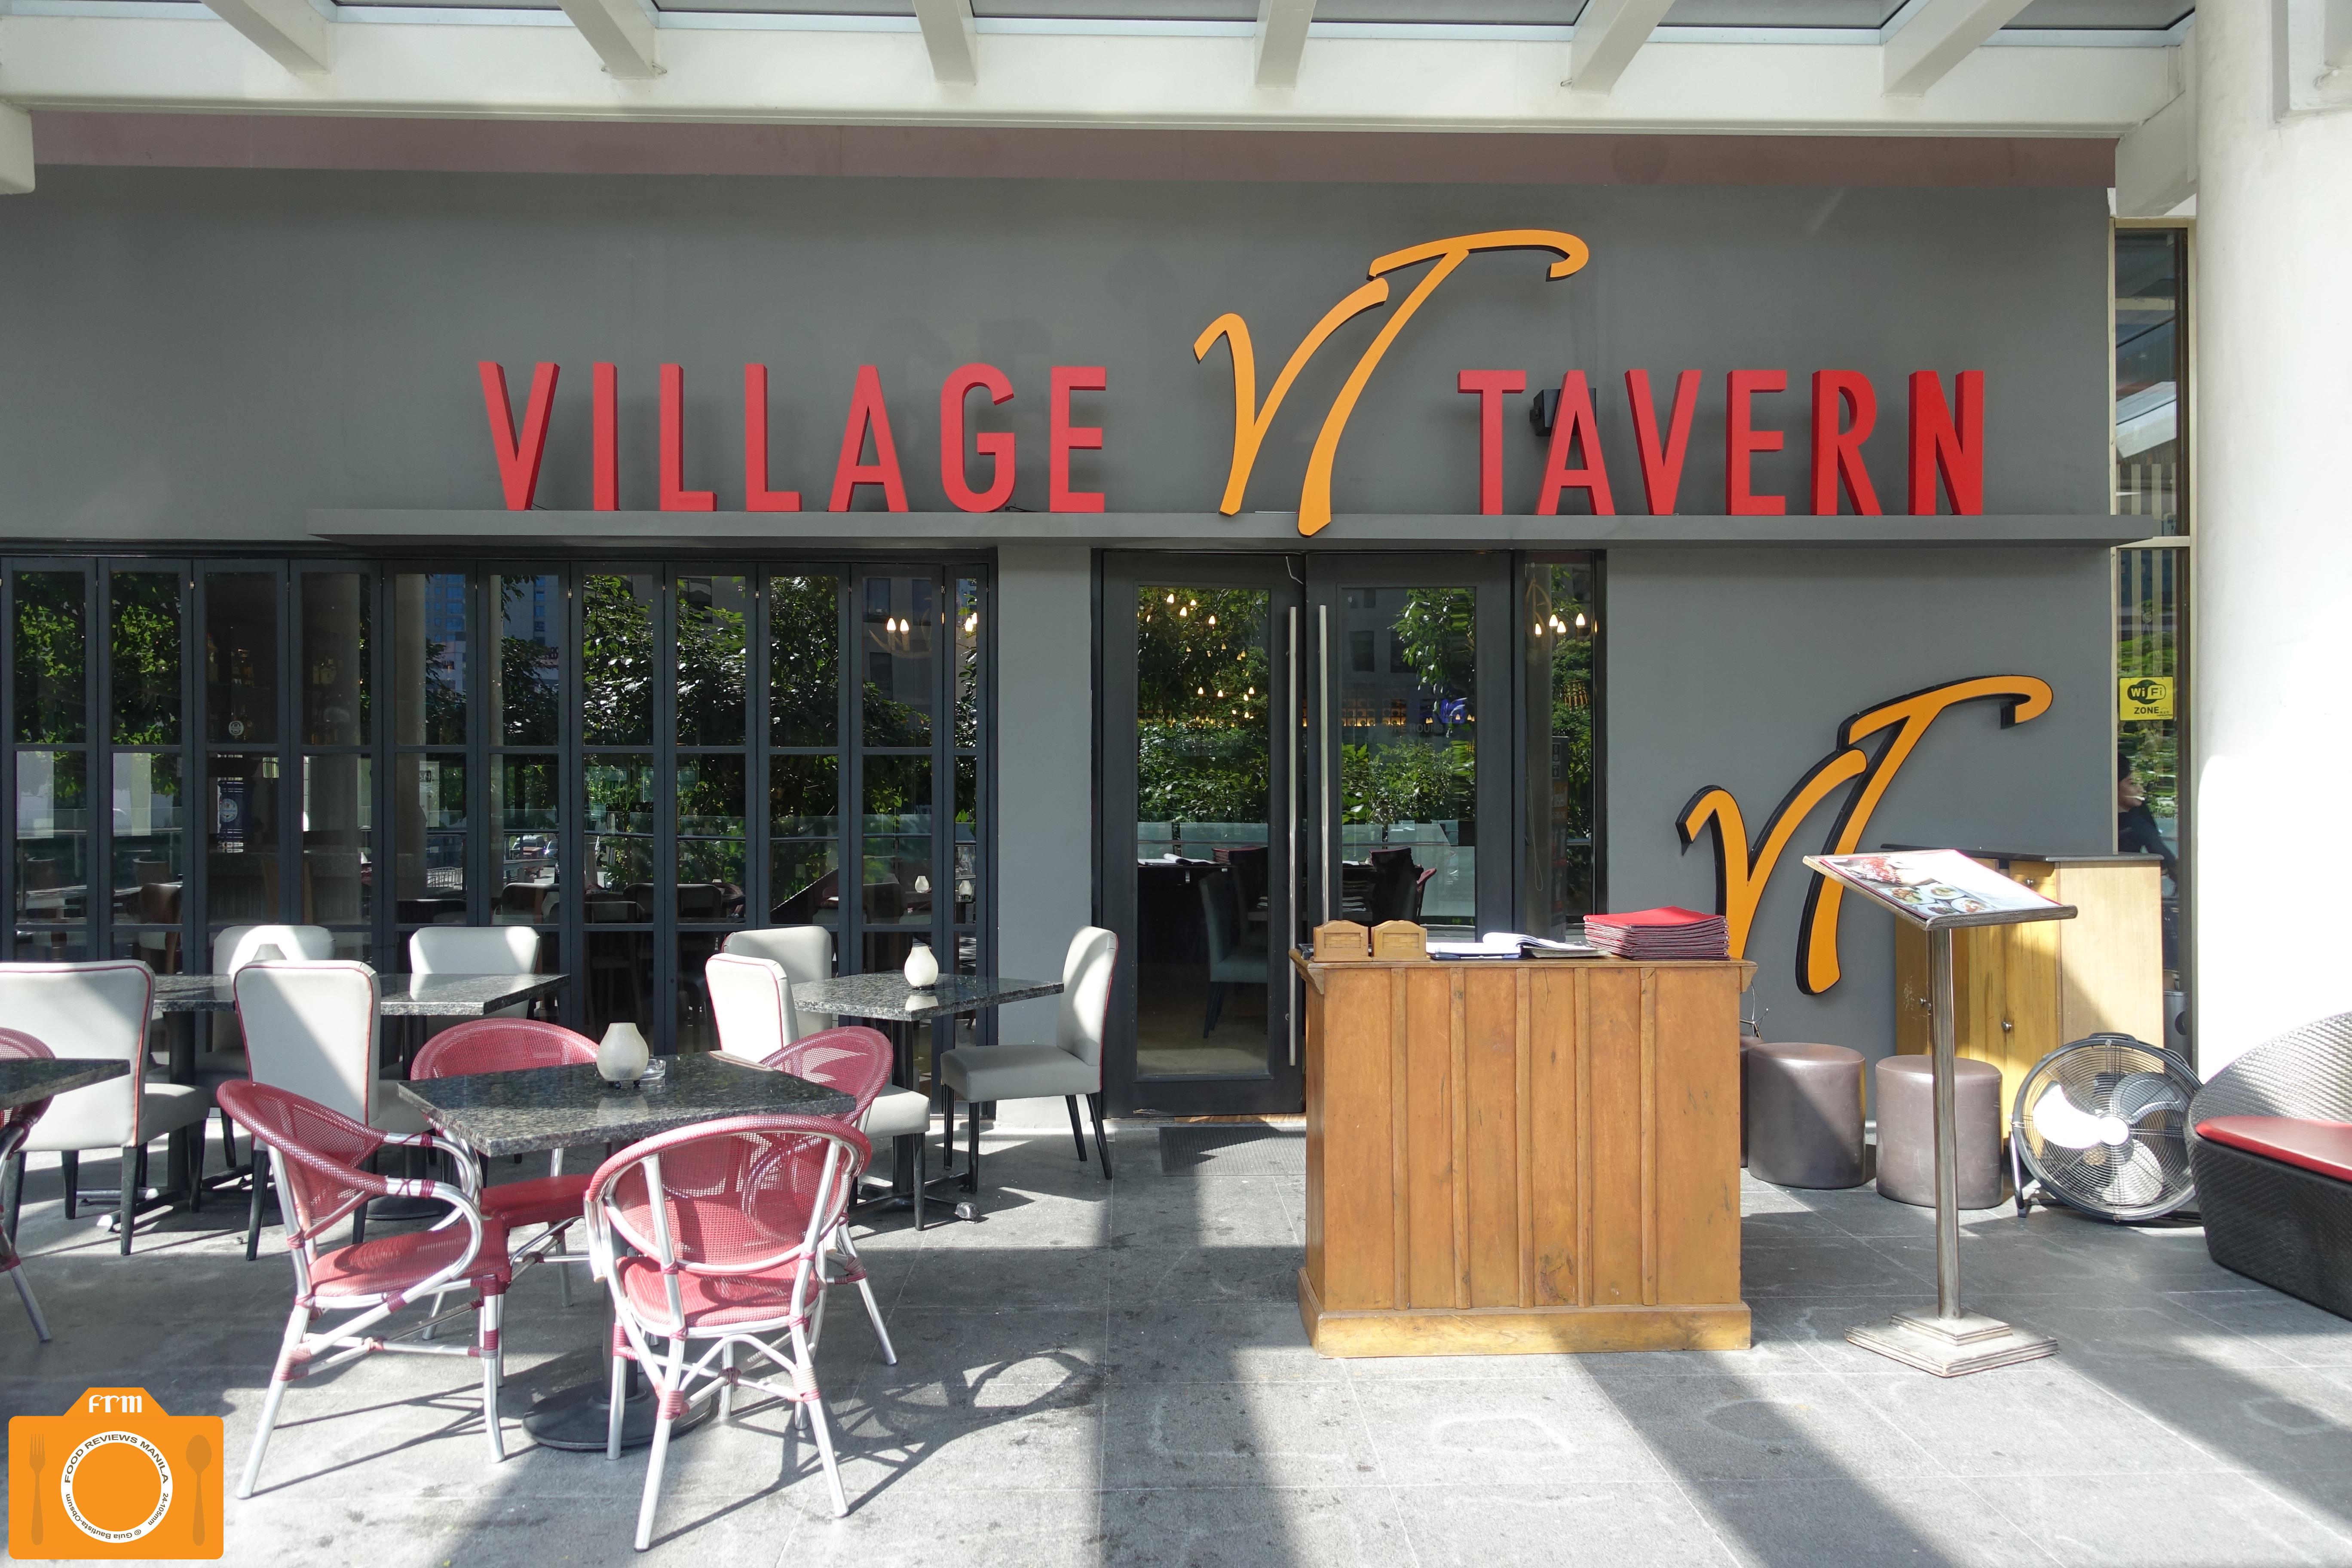 Village Tavern facade